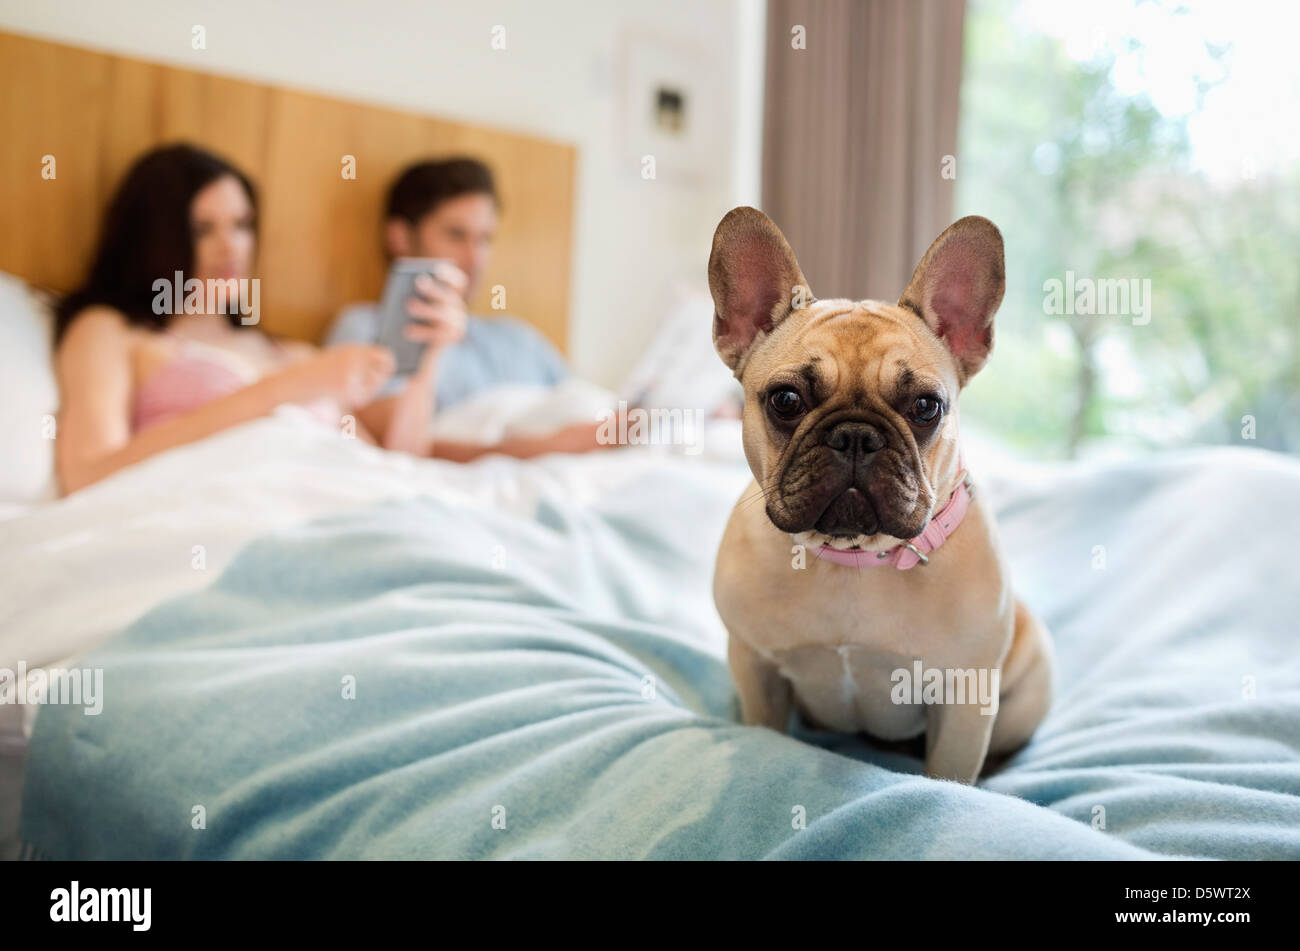 Perro sentado en la cama con la pareja Foto de stock